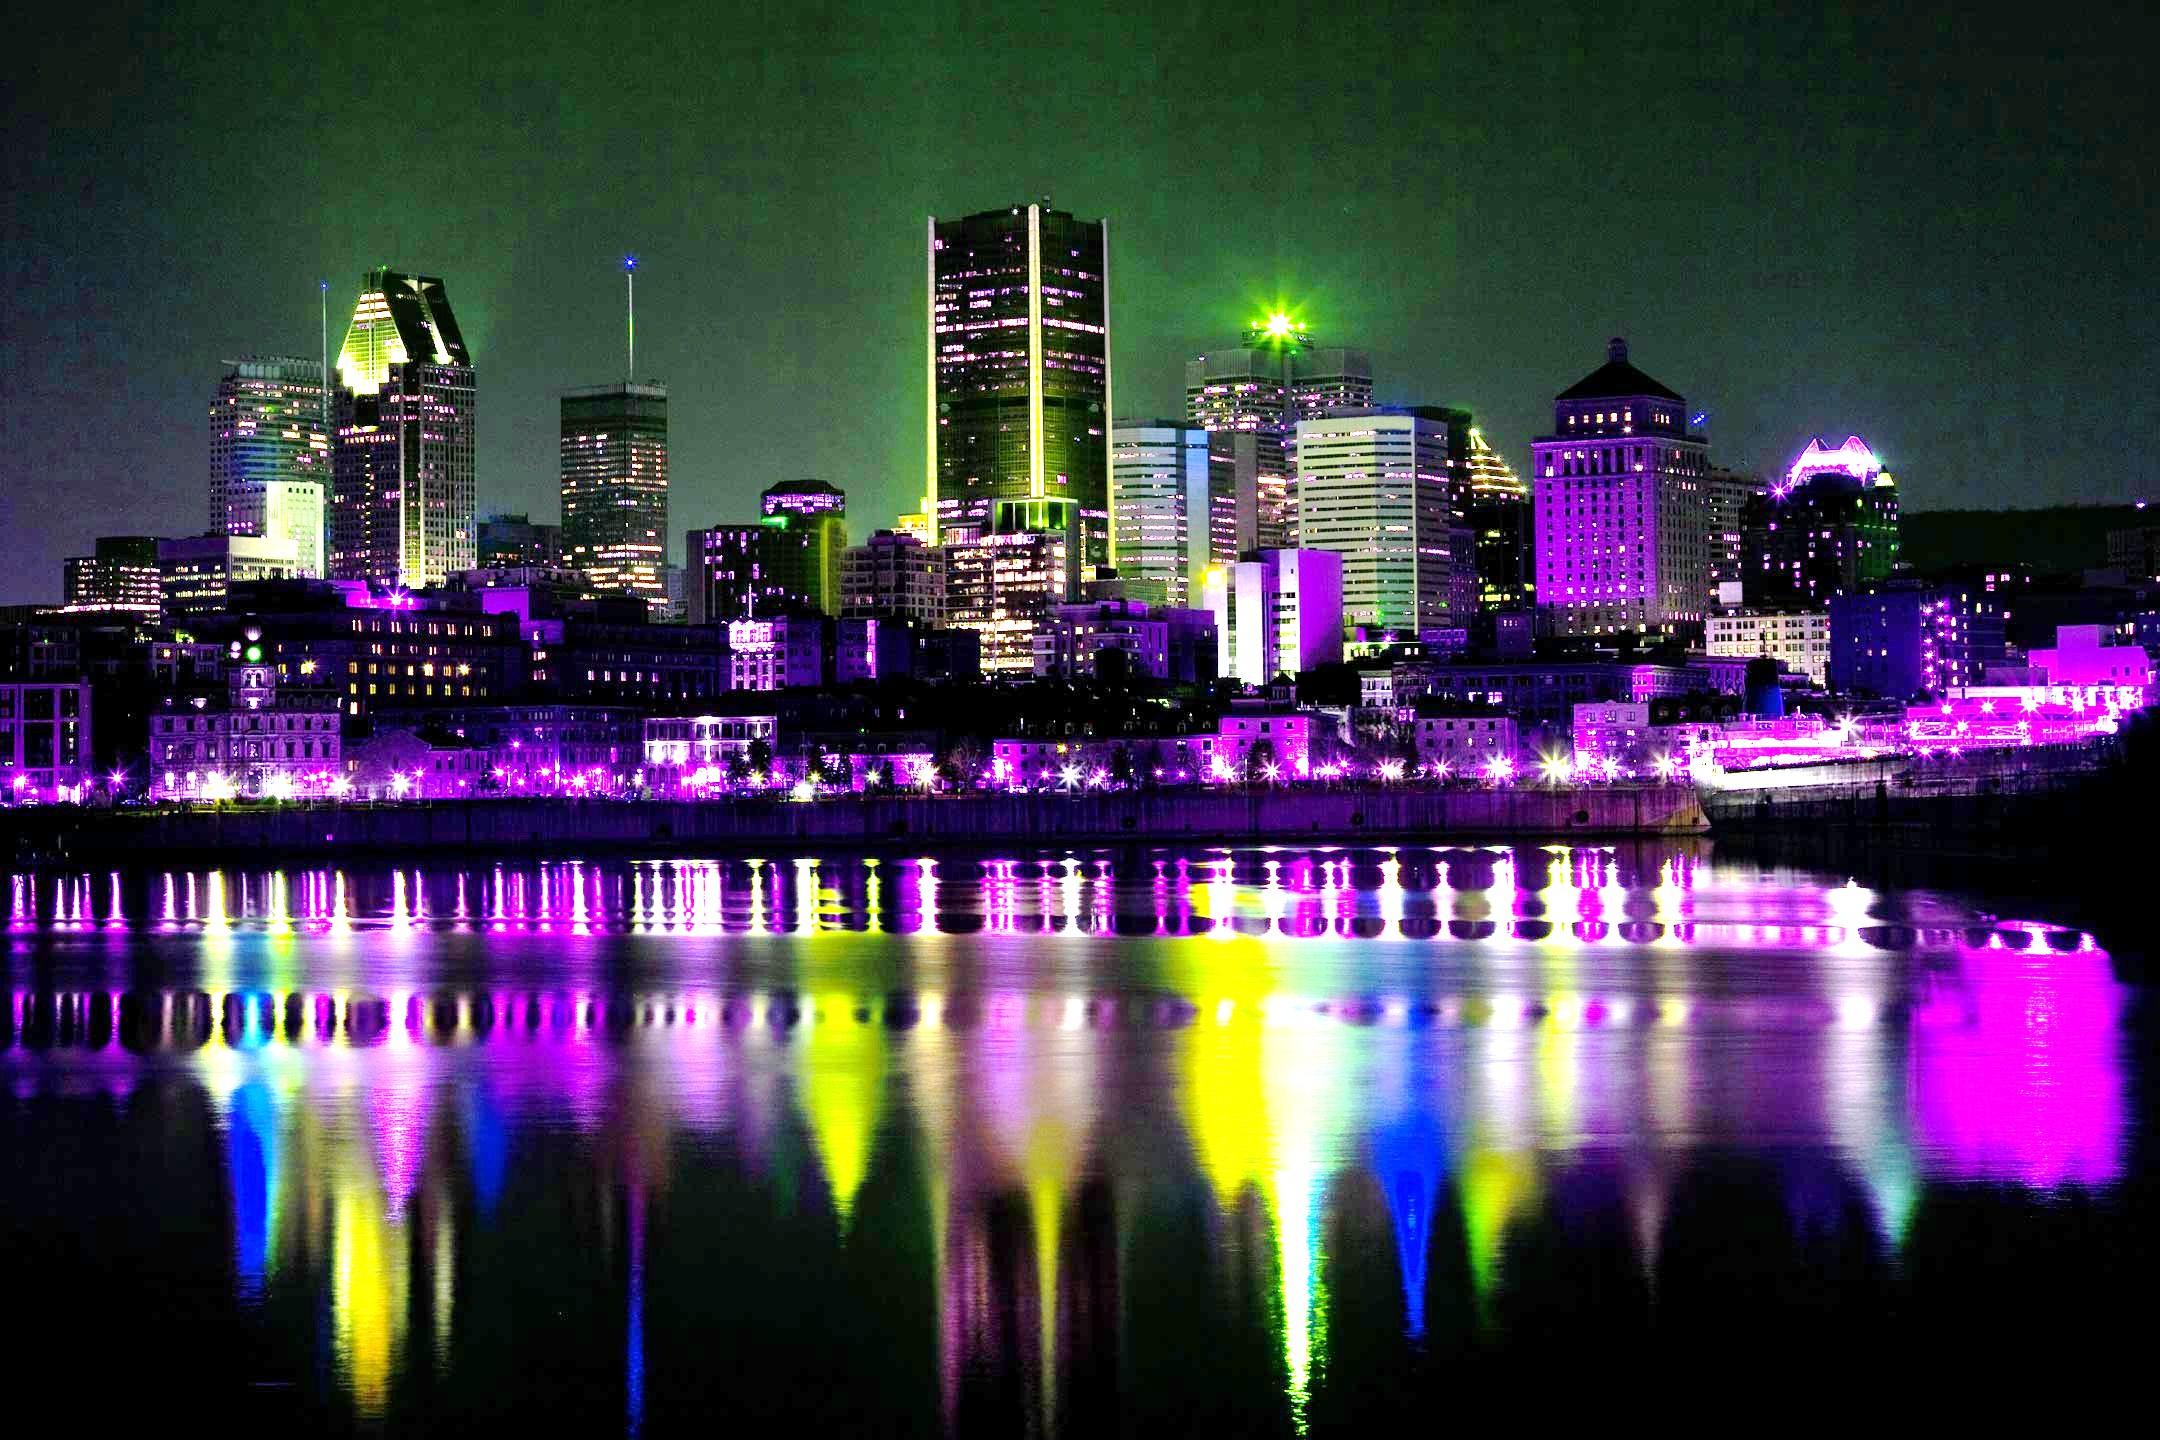 Montreal Nightclubs